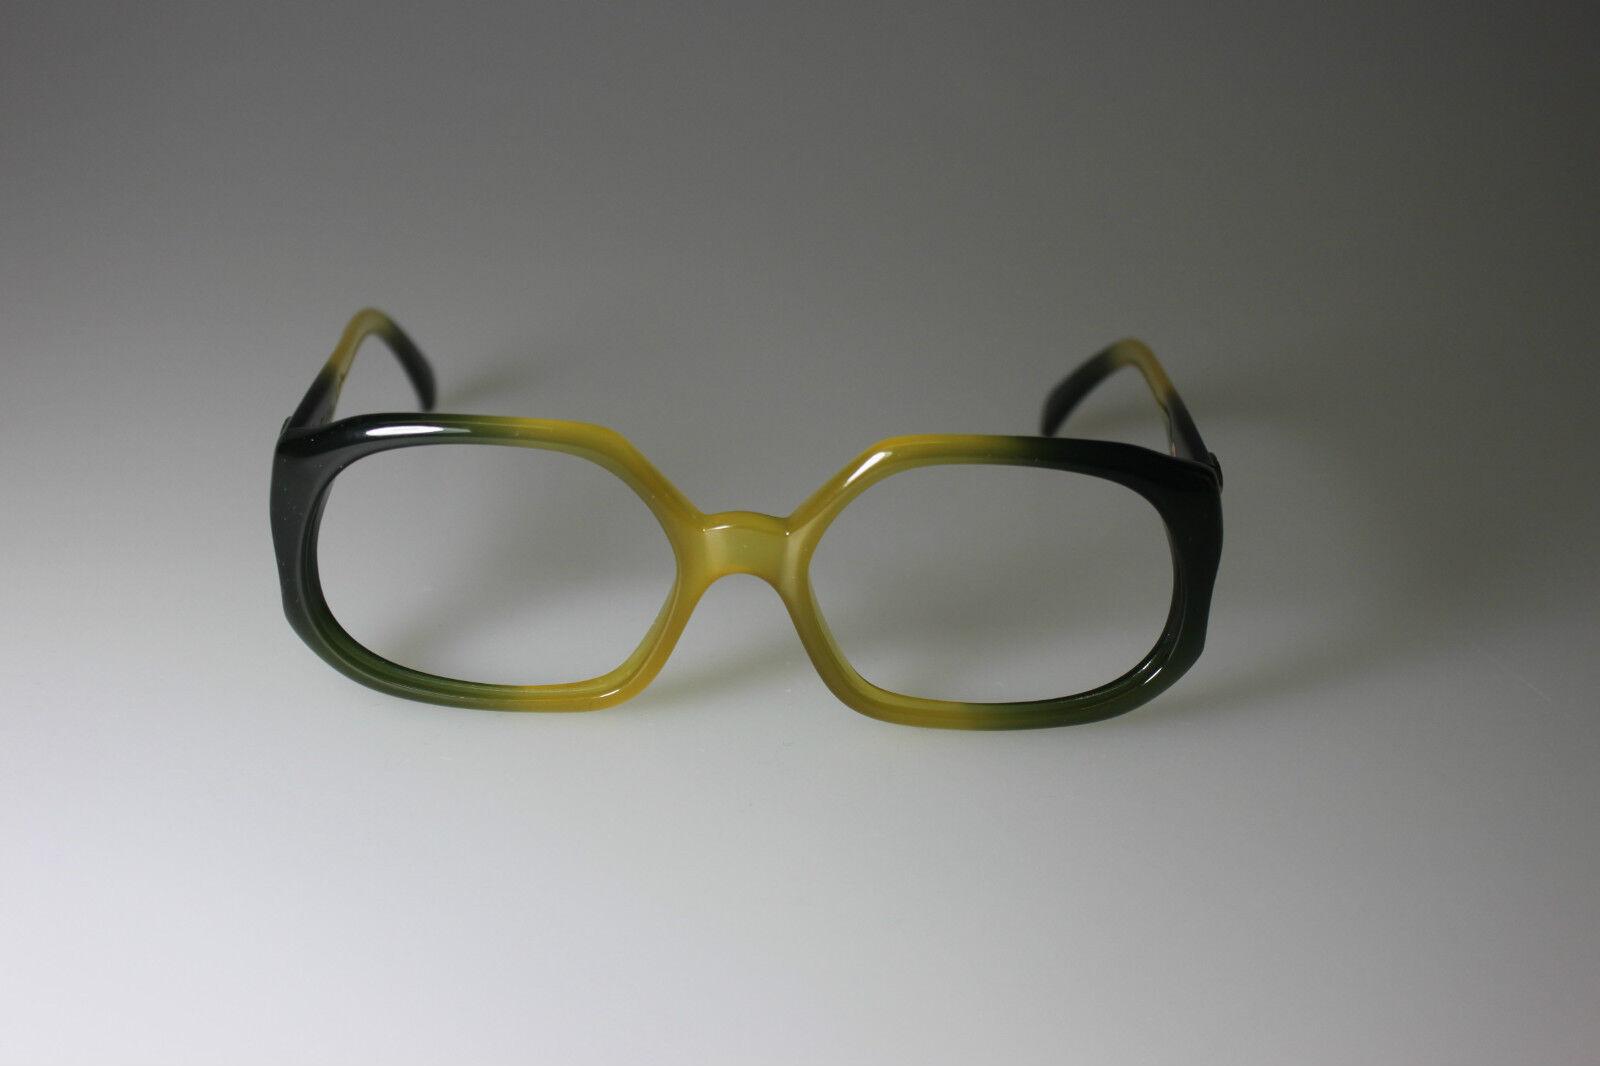 CHRISTIAN DIOR - 80ER DESIGNER BRILLE - Brillengestell Brillengestell Brillengestell Optyl- VINTAGE | Outlet Store  | Hohe Qualität  | Online-Exportgeschäft  a9e621